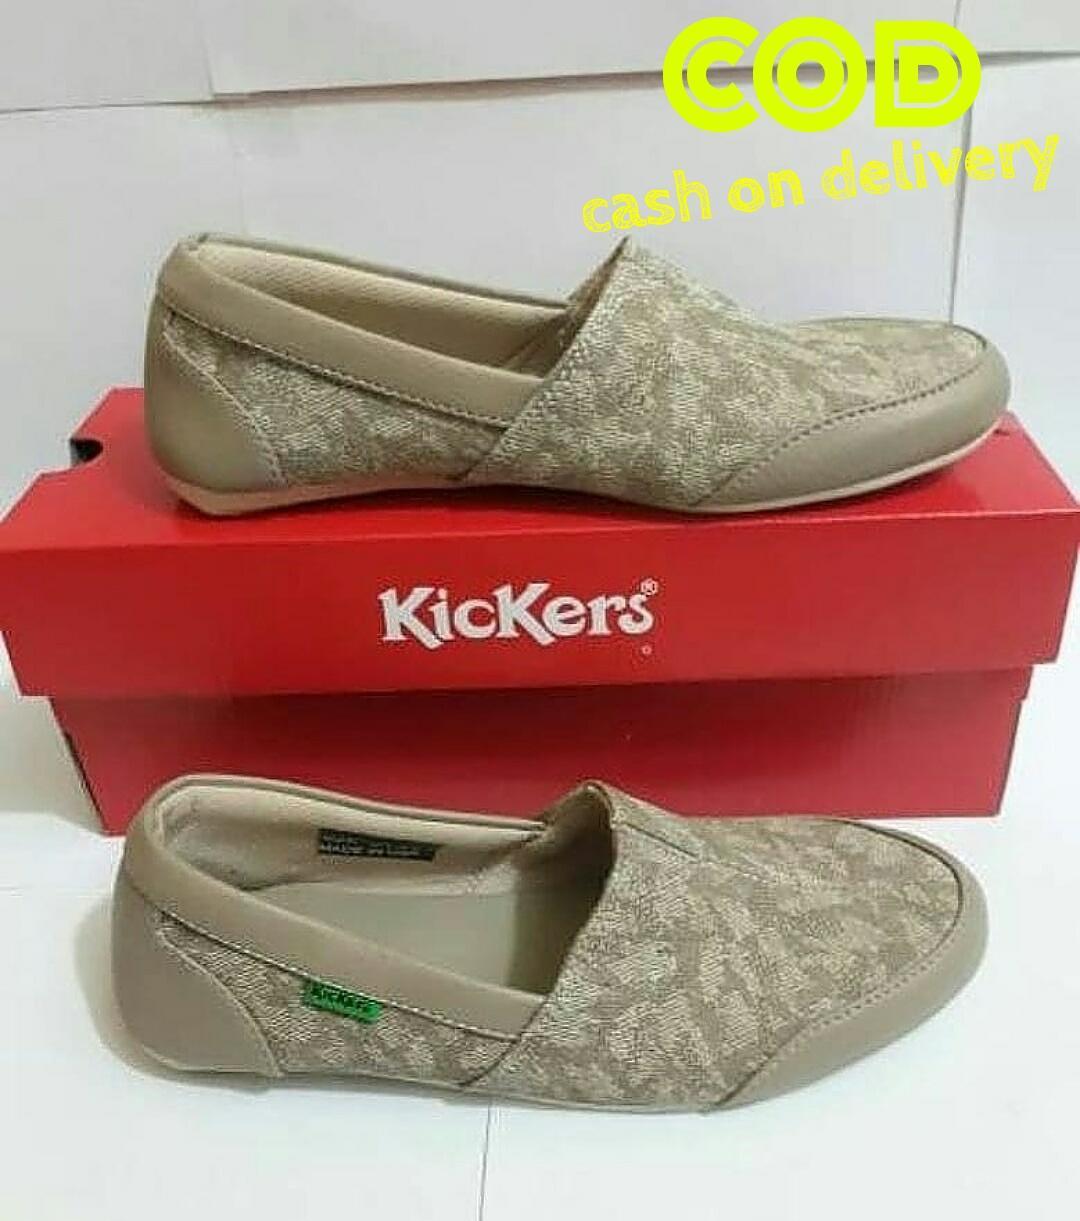 91+ Aneka Gambar Model Sepatu Wanita Kickers Kw Paling Keren